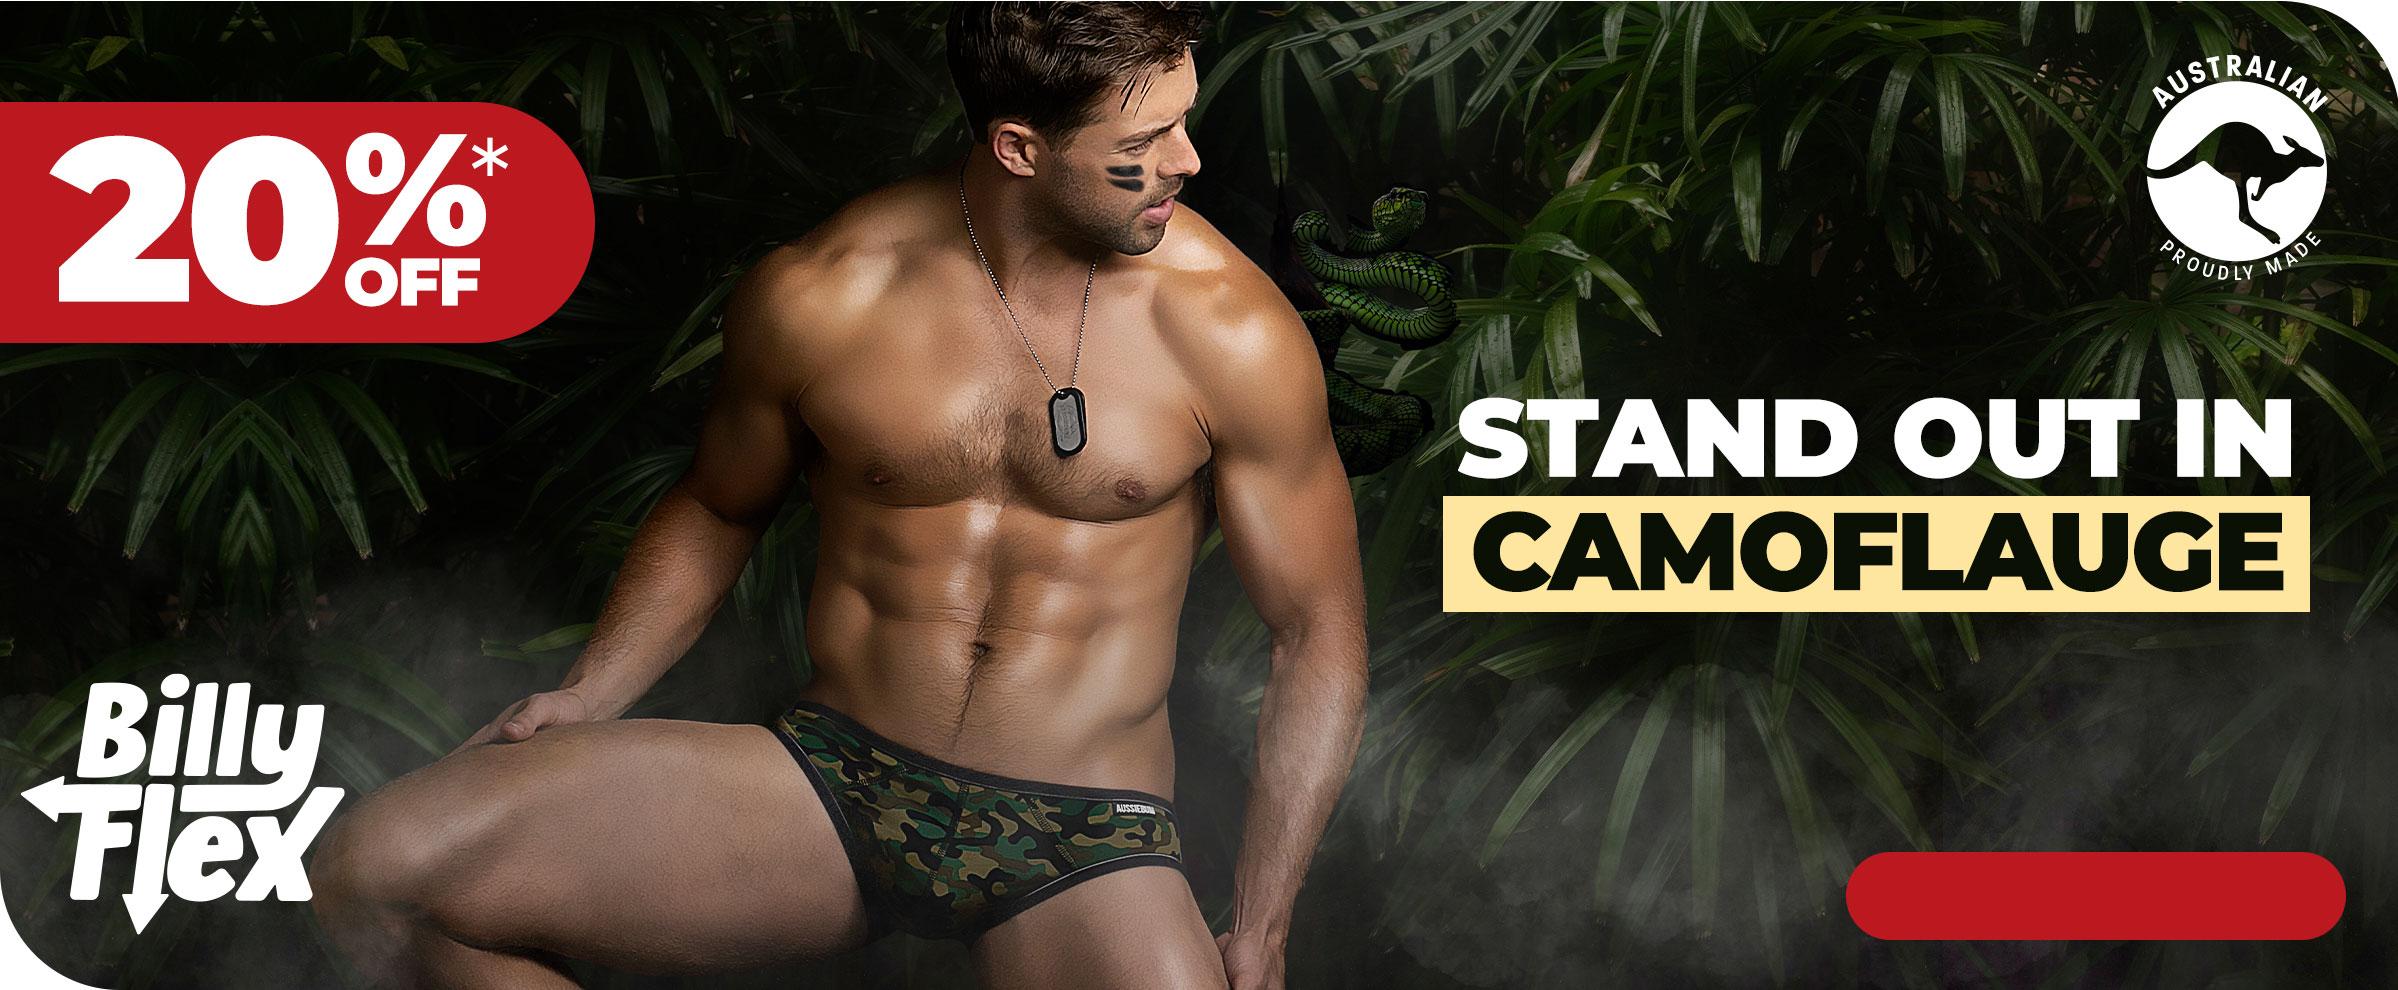 Billy Flex Camo Homepage Image